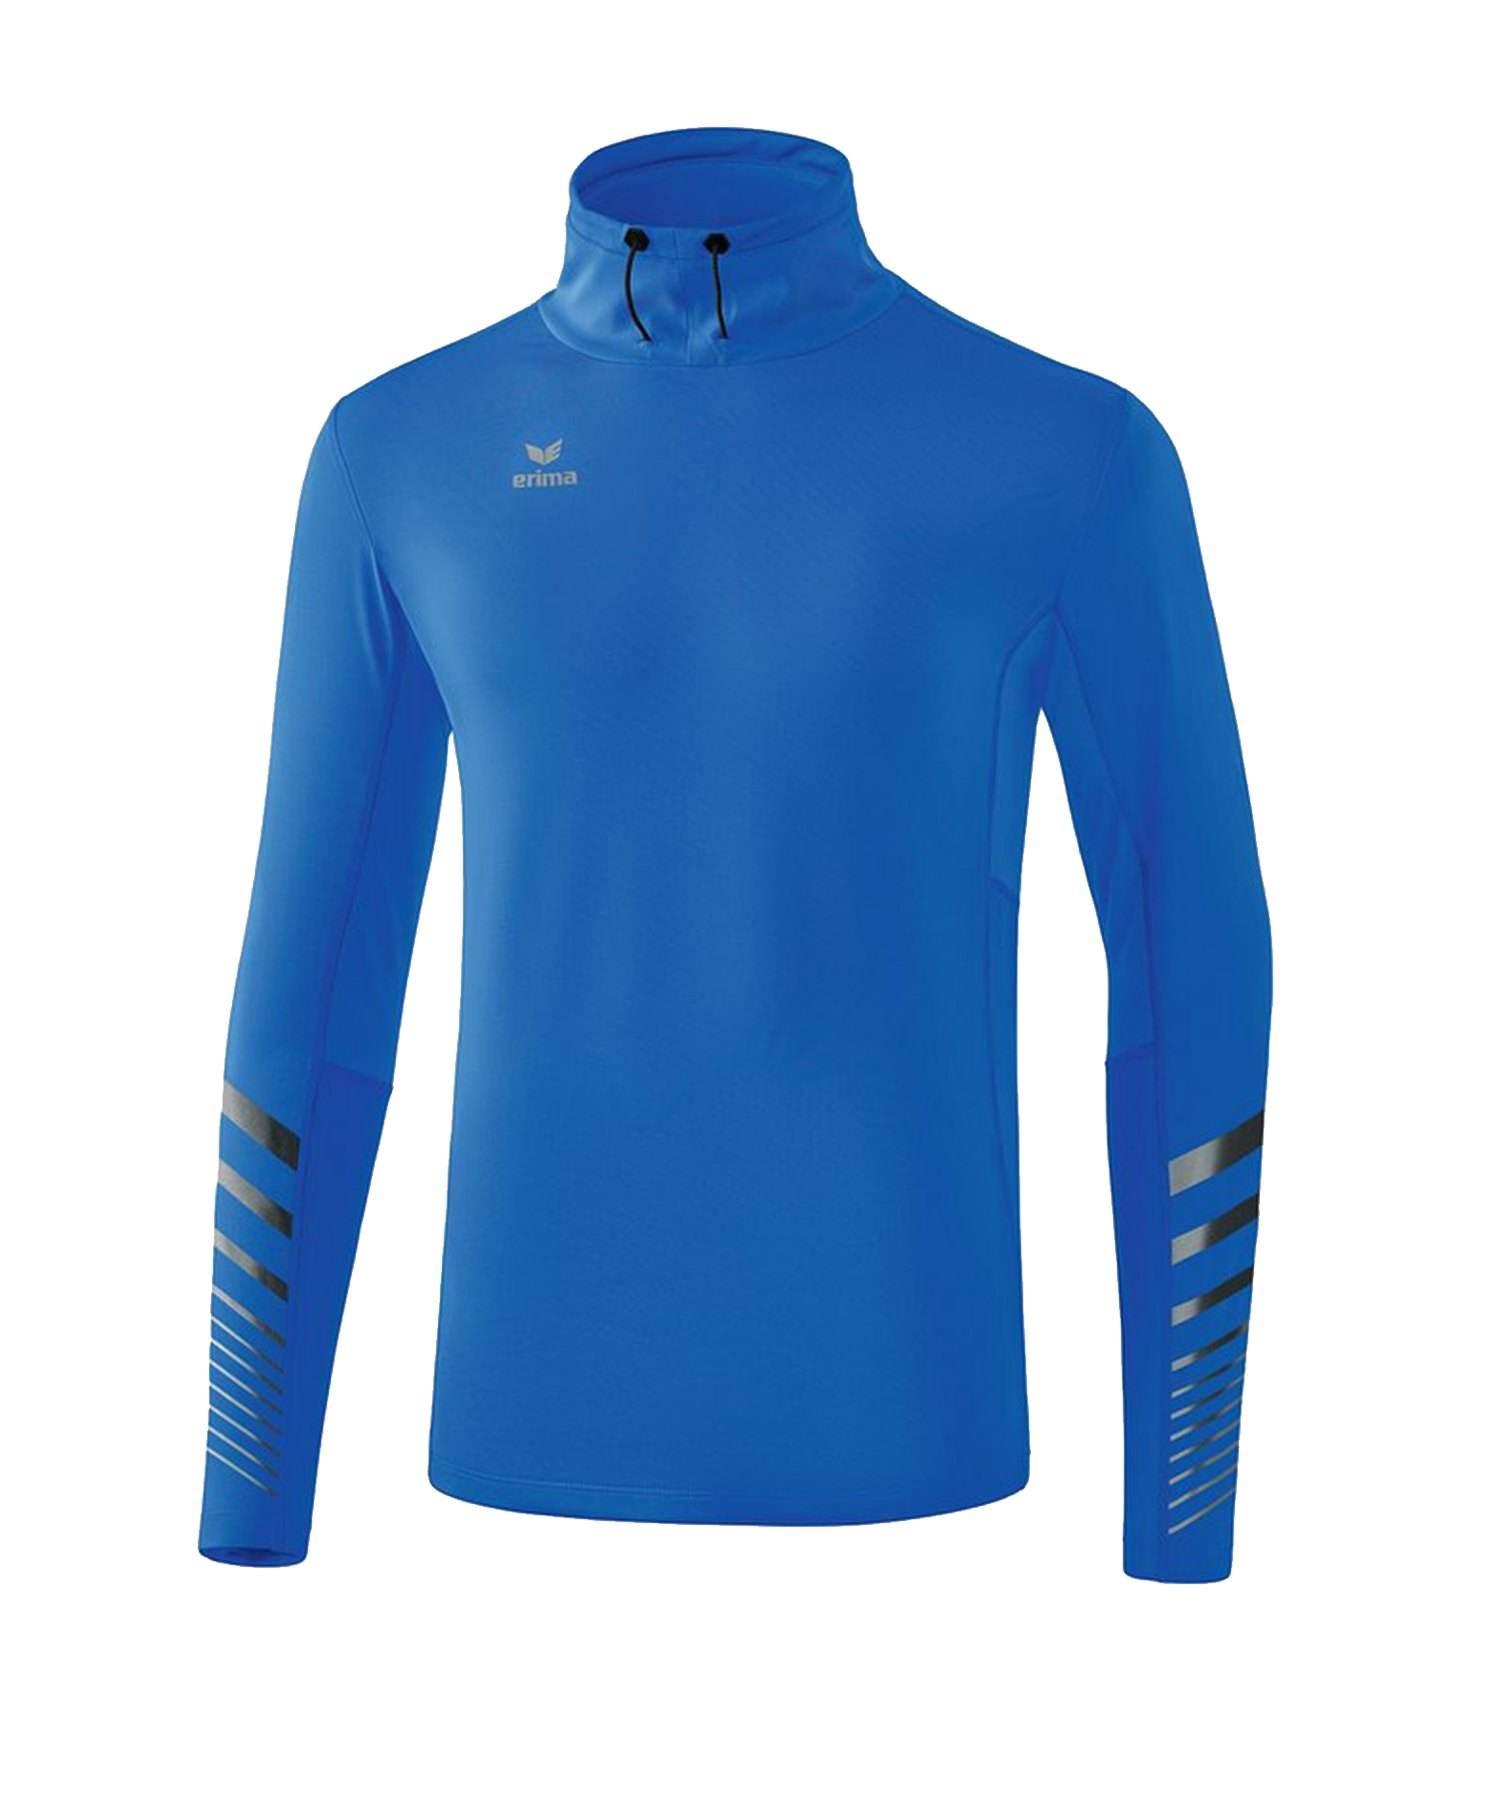 Erima Race Line 2.0 Running Longsleeve Blau - Blau